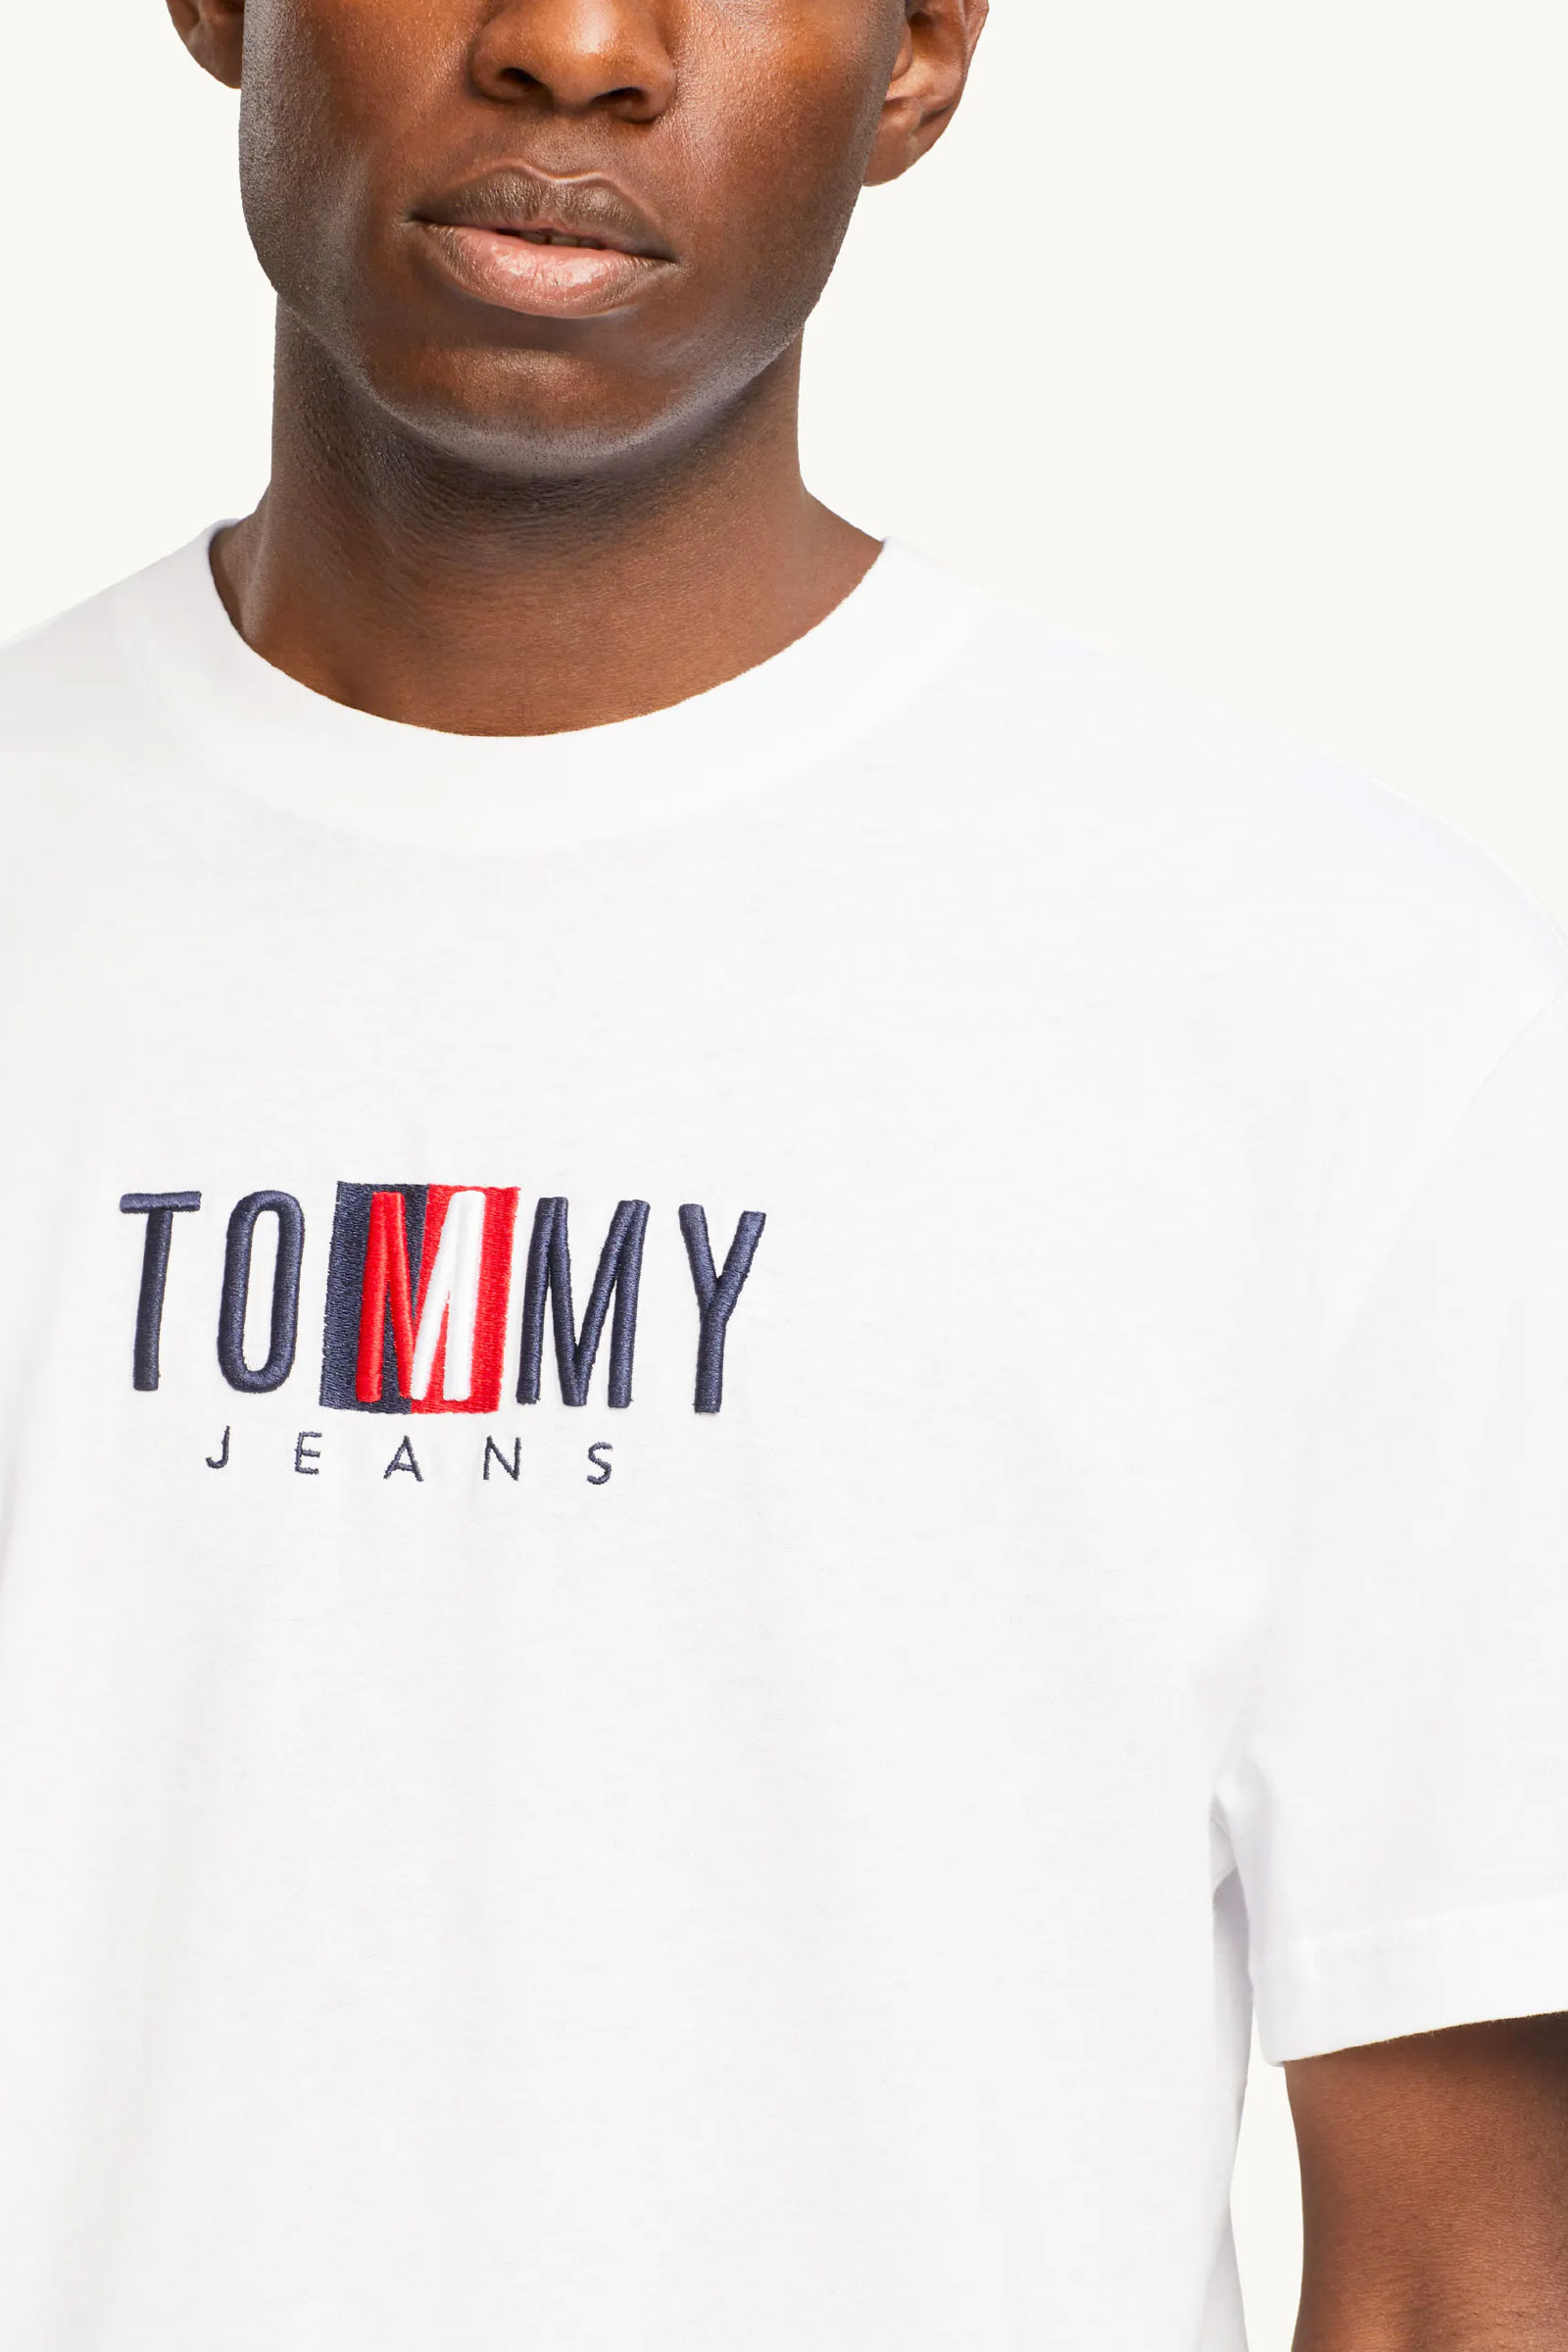 TOMMY JEANS | T-Shirt | DM0DM10218YBR